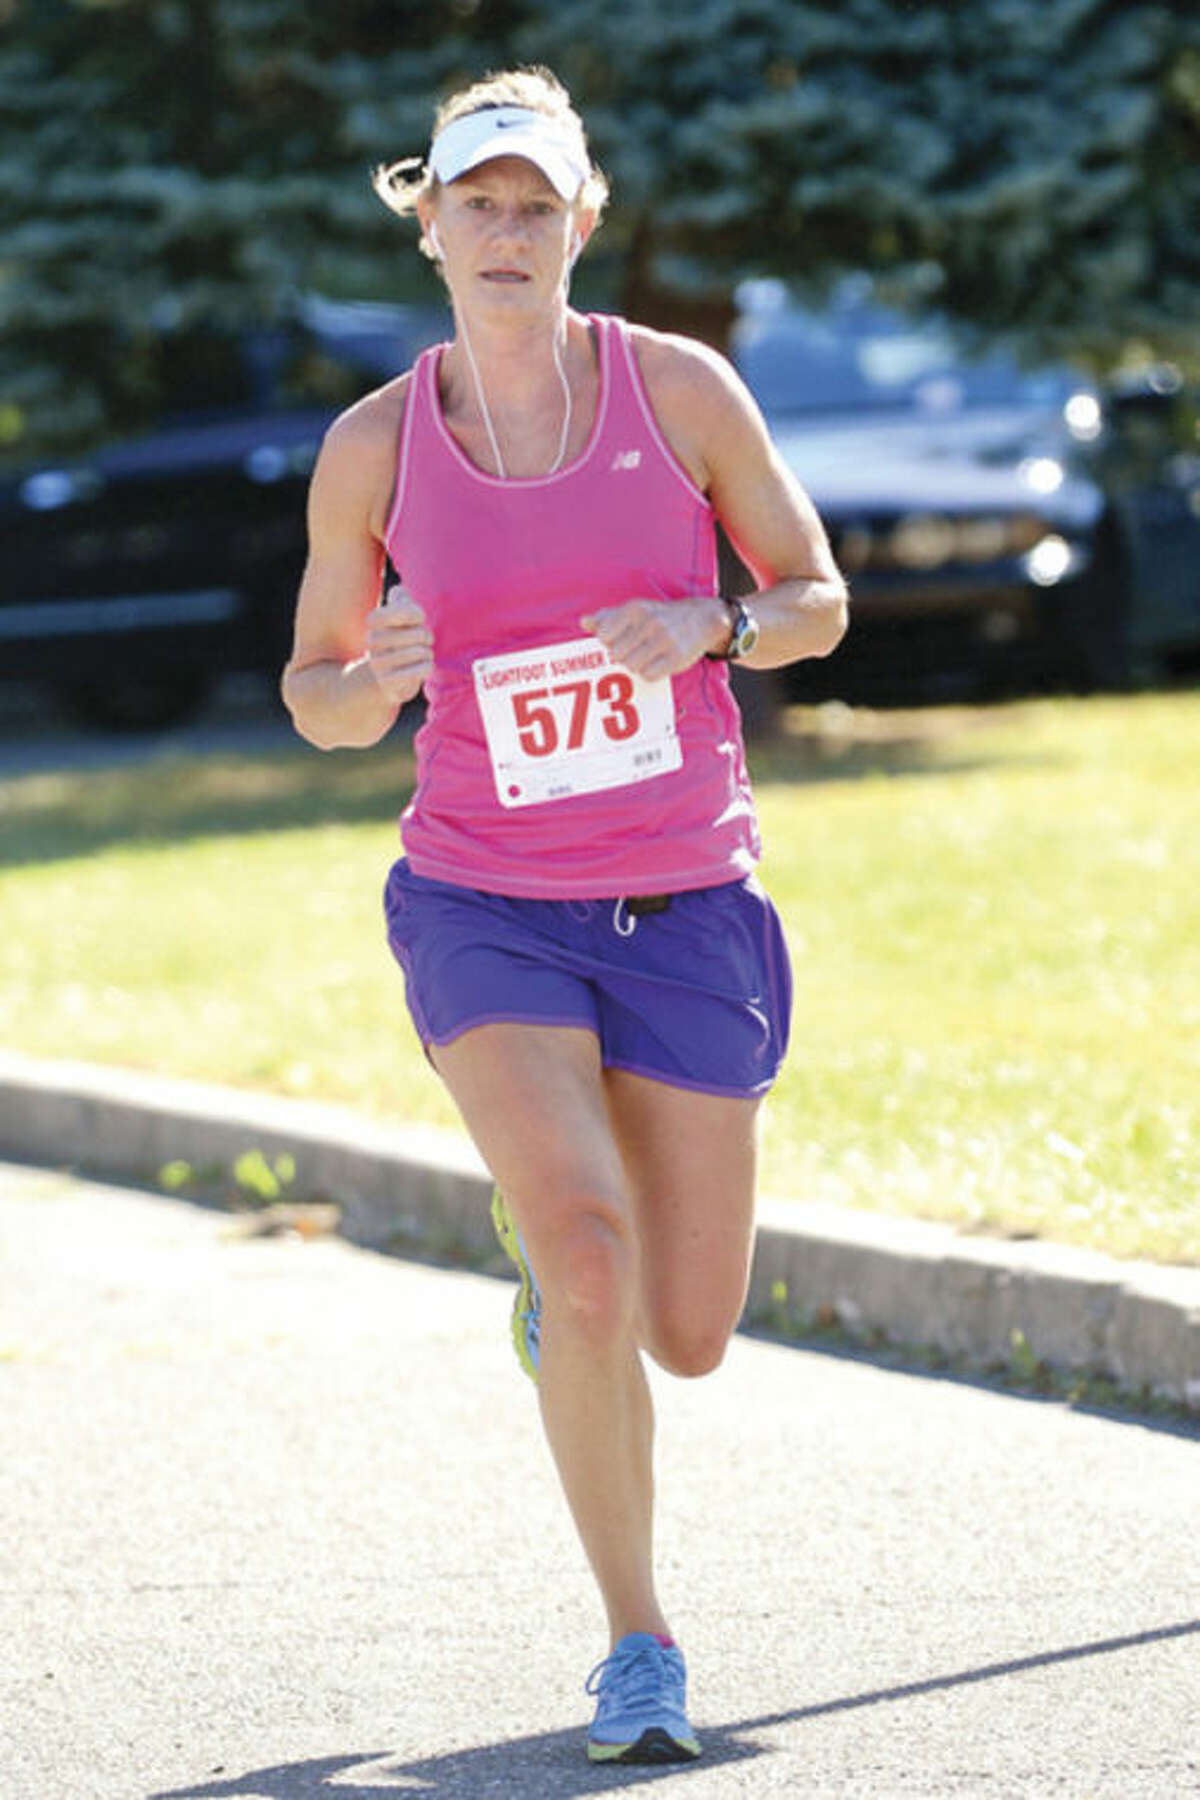 Lisa Martin is the first women finisher in The Lightfoot Running Club and the Norwalk Recreation and Parks Department 36th annual Sam Elpern Memorial Half-Marathon Saturday at Fox Run Elementary School. Hour photo / Erik Trautmann